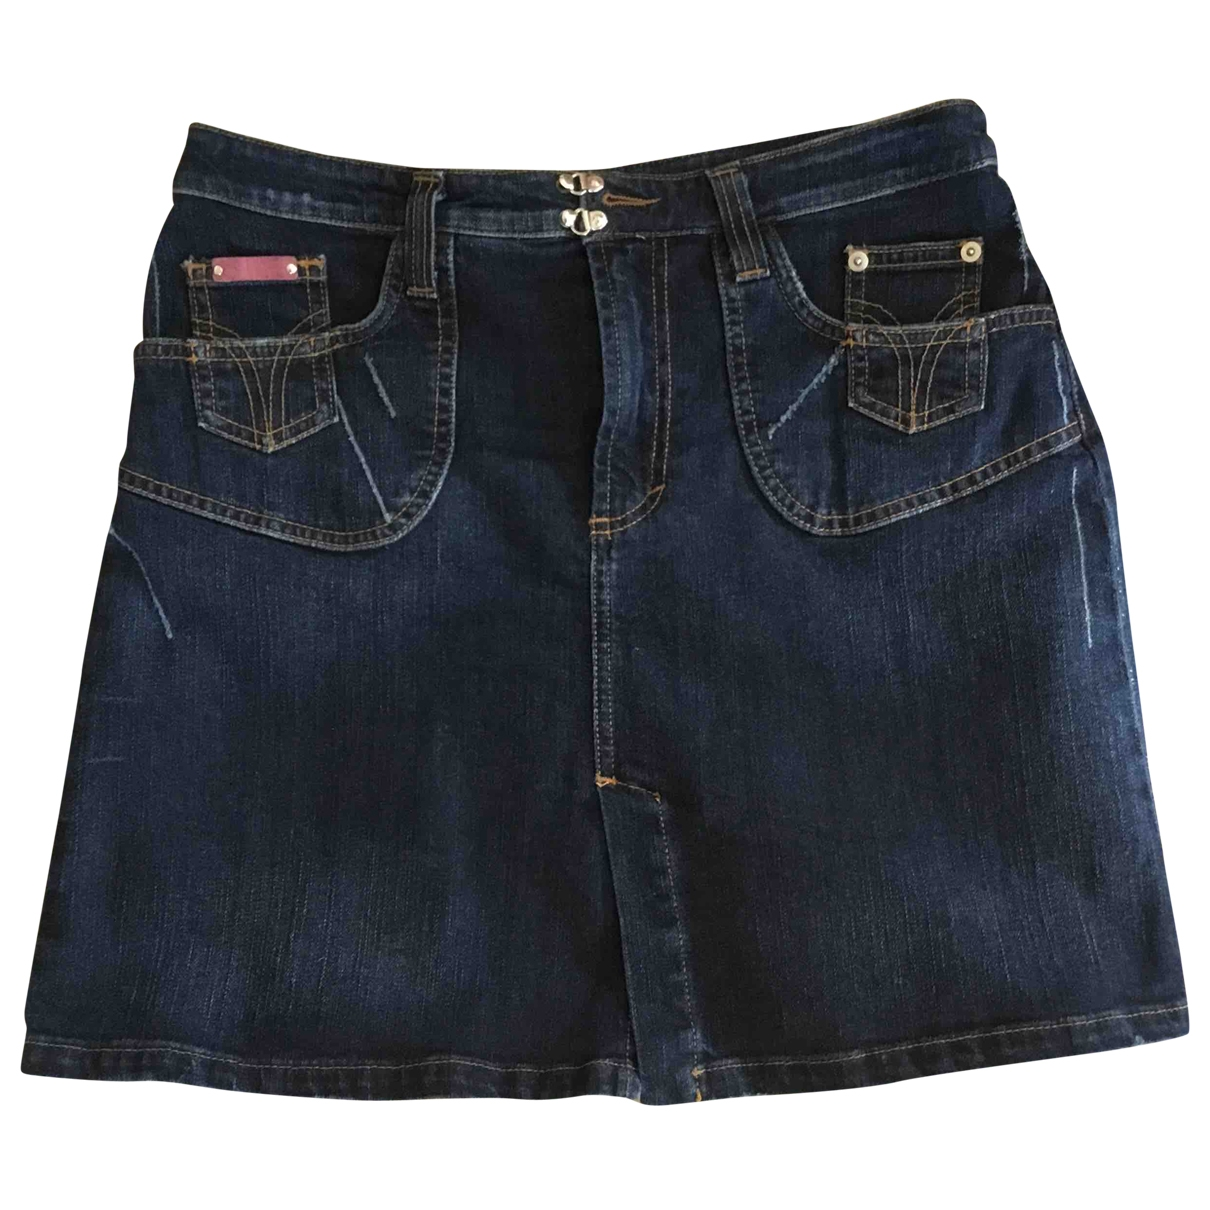 D&g \N Rocke in  Marine Denim - Jeans